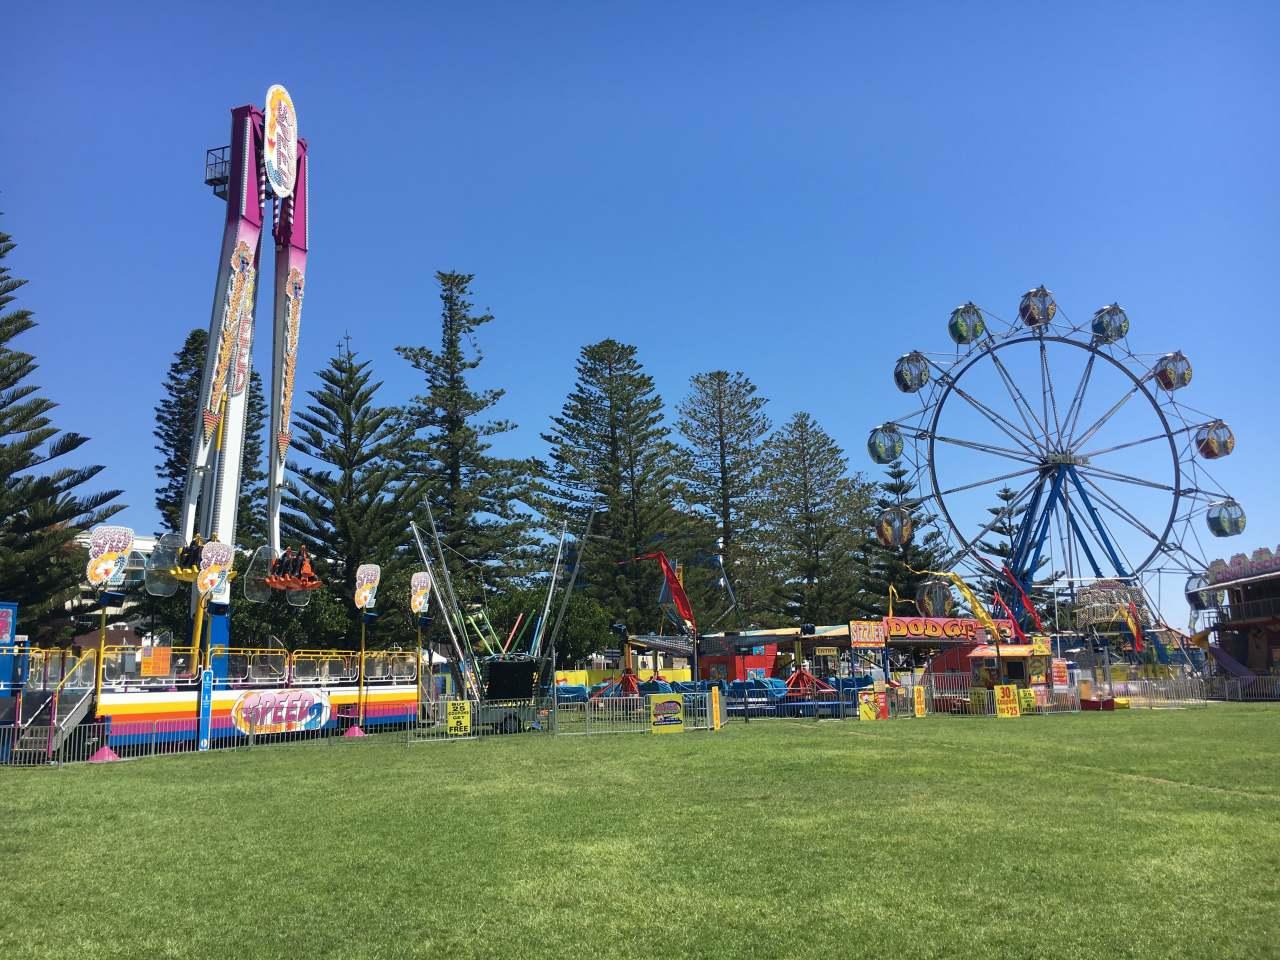 The Entrance Carnival, Memorial Park